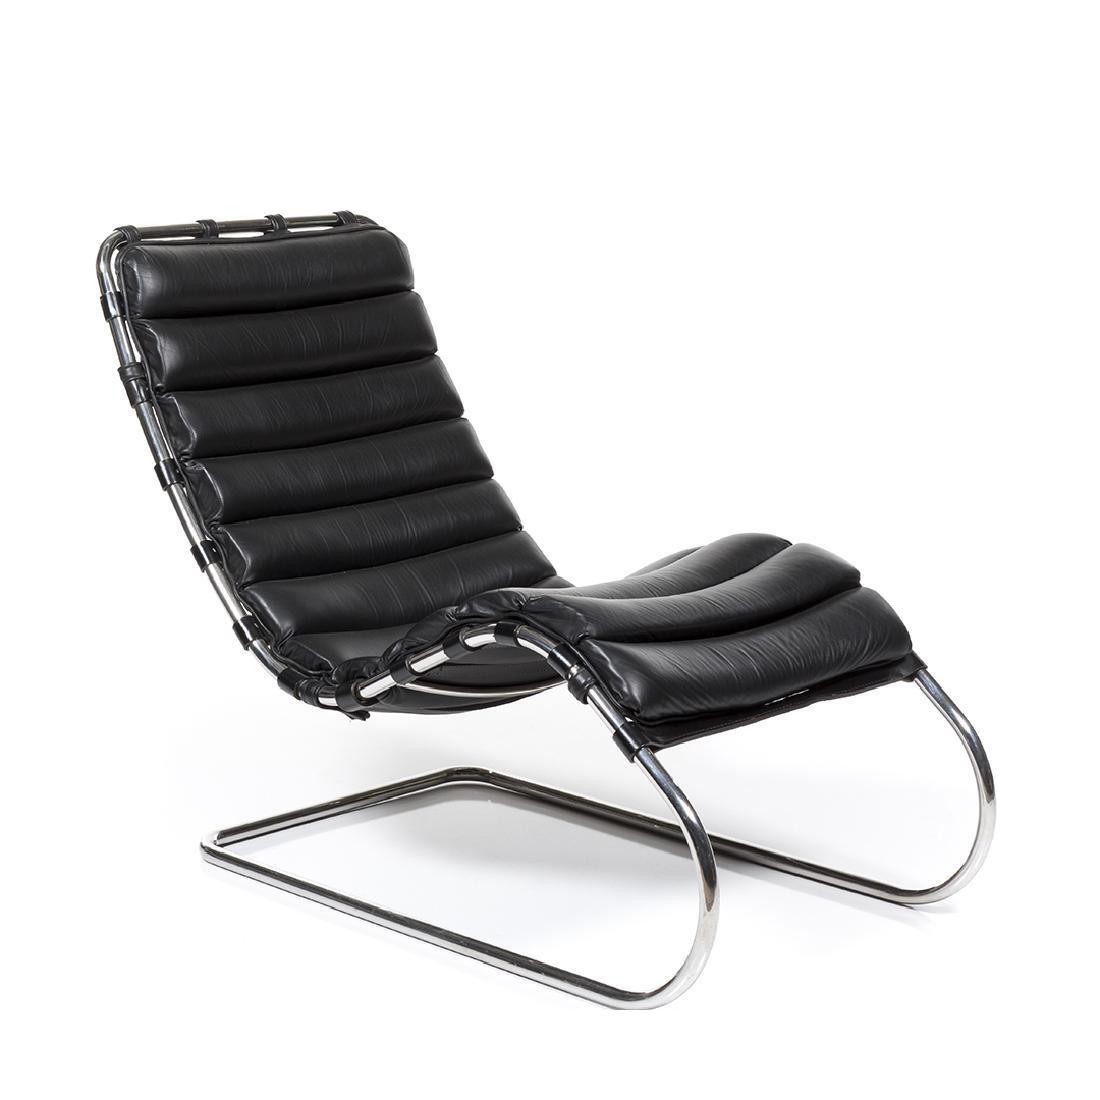 De Haute Qualite Mies Van Der Rohe Mr Chaise Lounge Chair